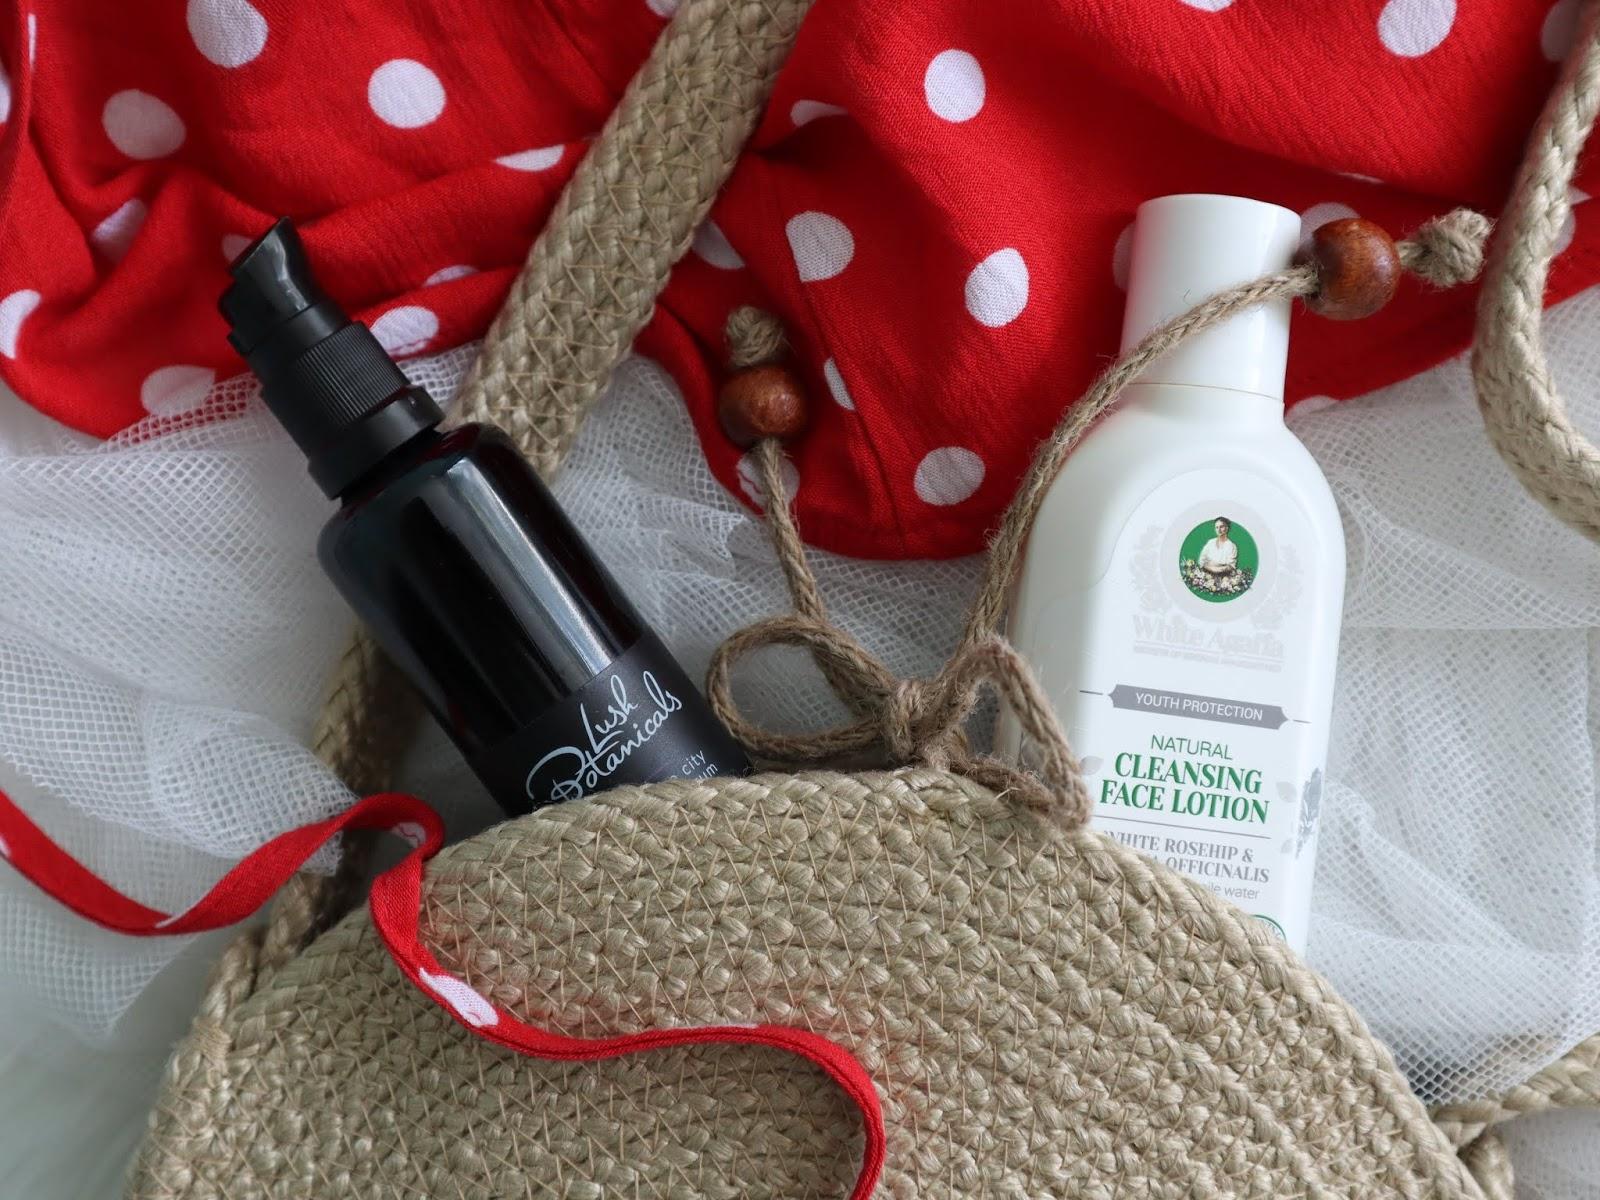 kosmetyki-naturalne-lush-botanicals